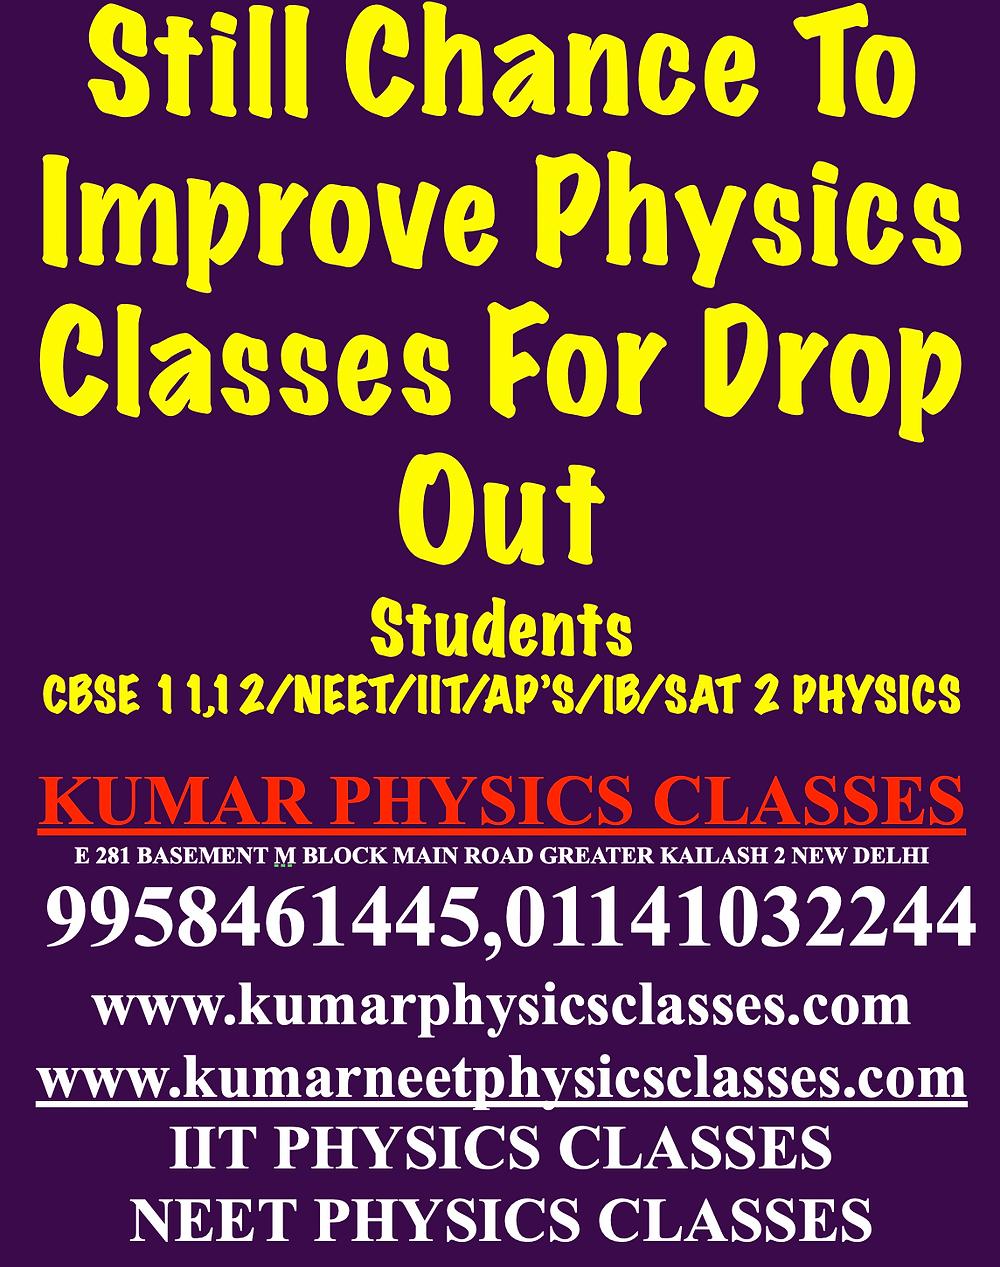 Still Chance To Improve Physics Classes For Drop Out Students CBSE 11,12/NEET/IIT/AP'S/IB/SAT 2 PHYSICS  KUMAR PHYSICS CLASSES E 281 BASEMENT M BLOCK MAIN ROAD GREATER KAILASH 2 NEW DELHI  9958461445,01141032244 www.kumarphysicsclasses.com www.kumarneetphysicsclasses.com IIT PHYSICS CLASSES NEET PHYSICS CLASSES